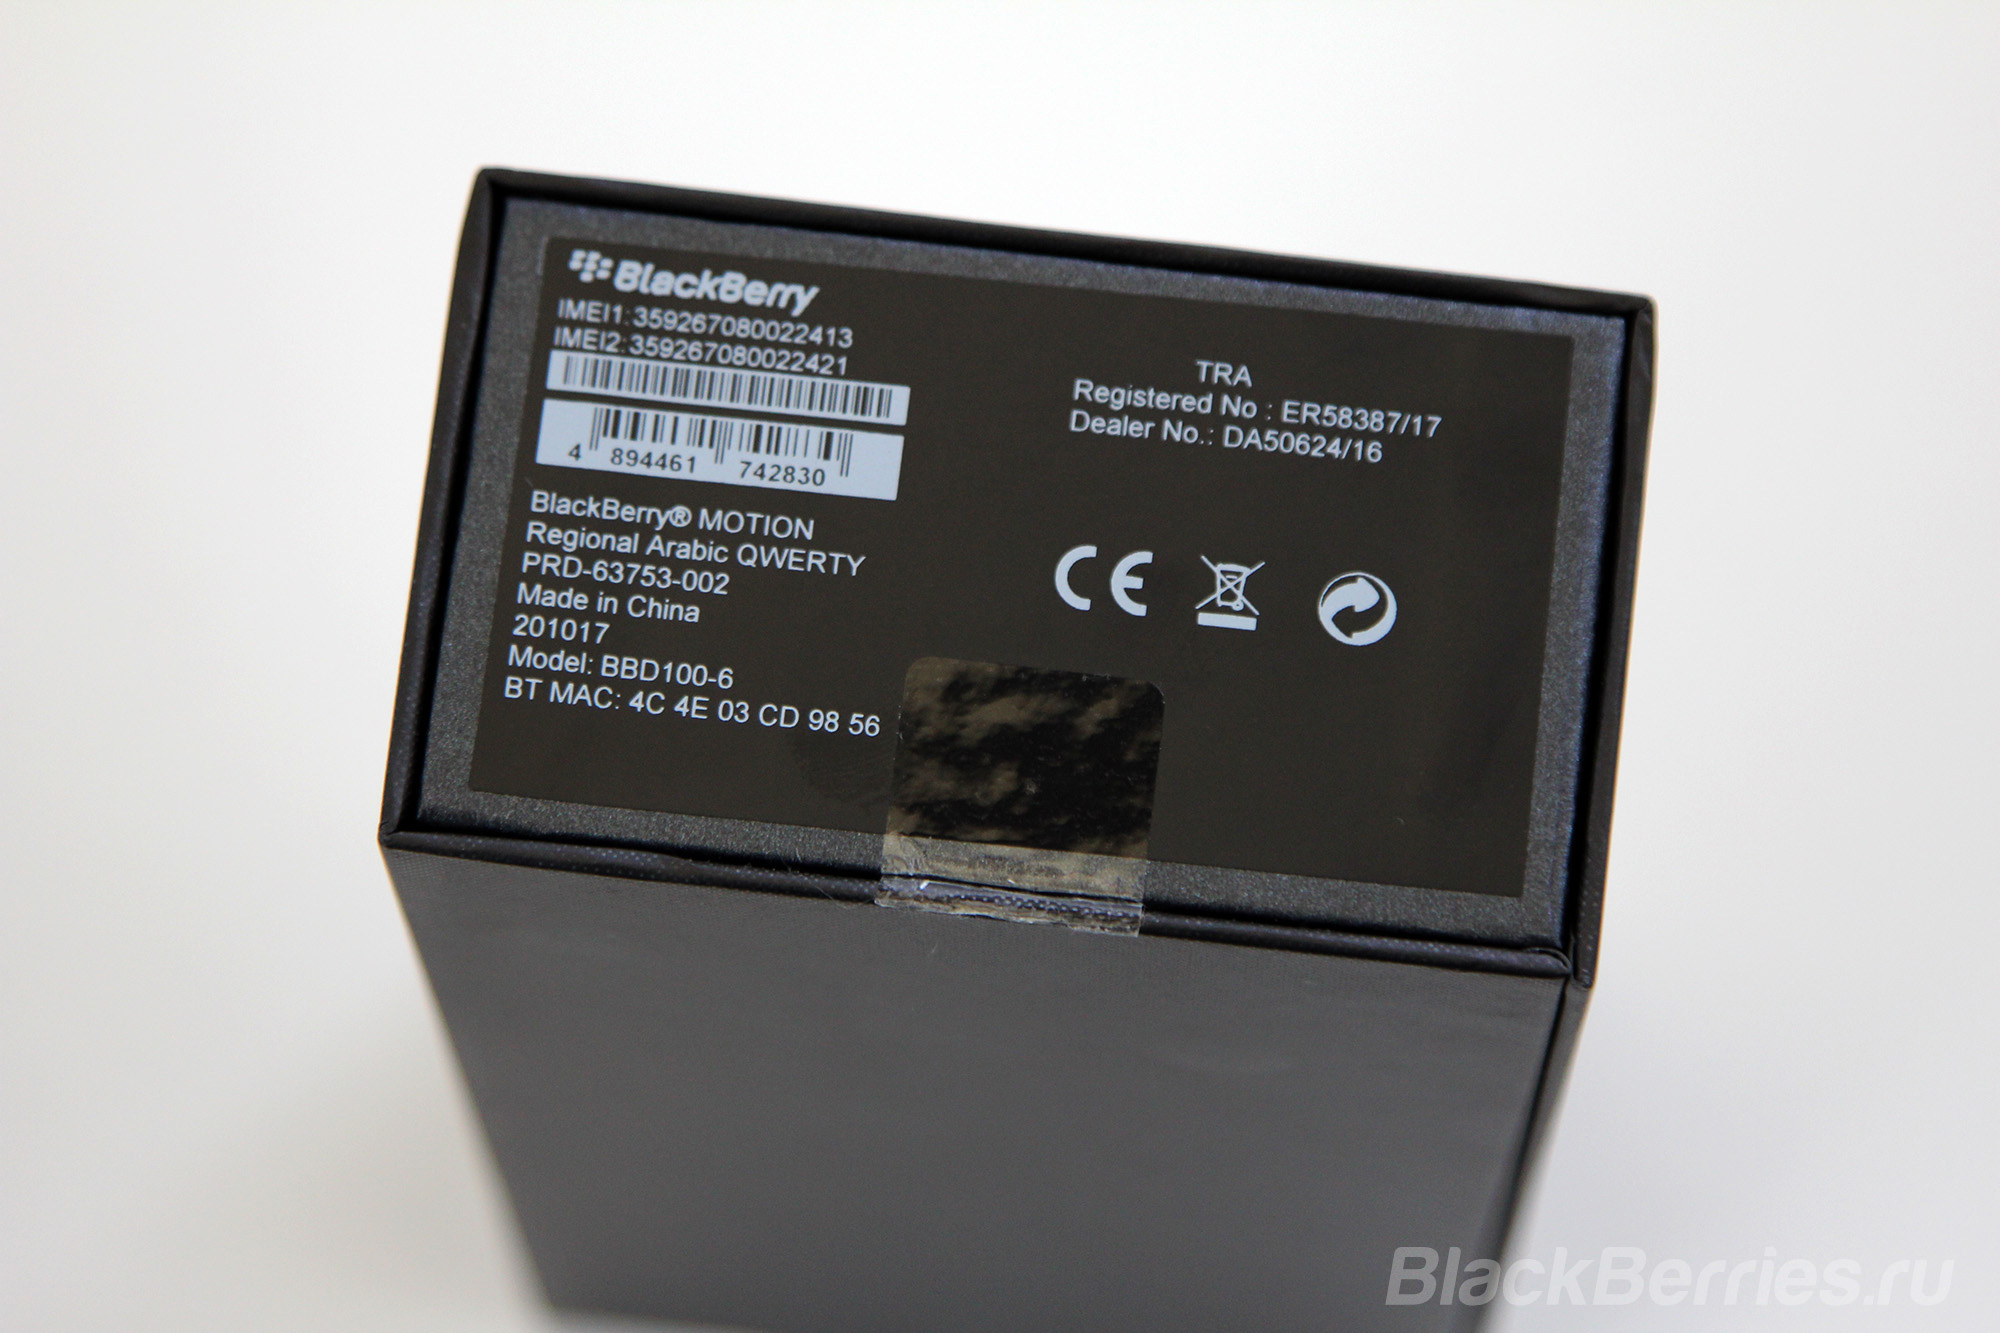 Blackberry Motion外盒手机信息